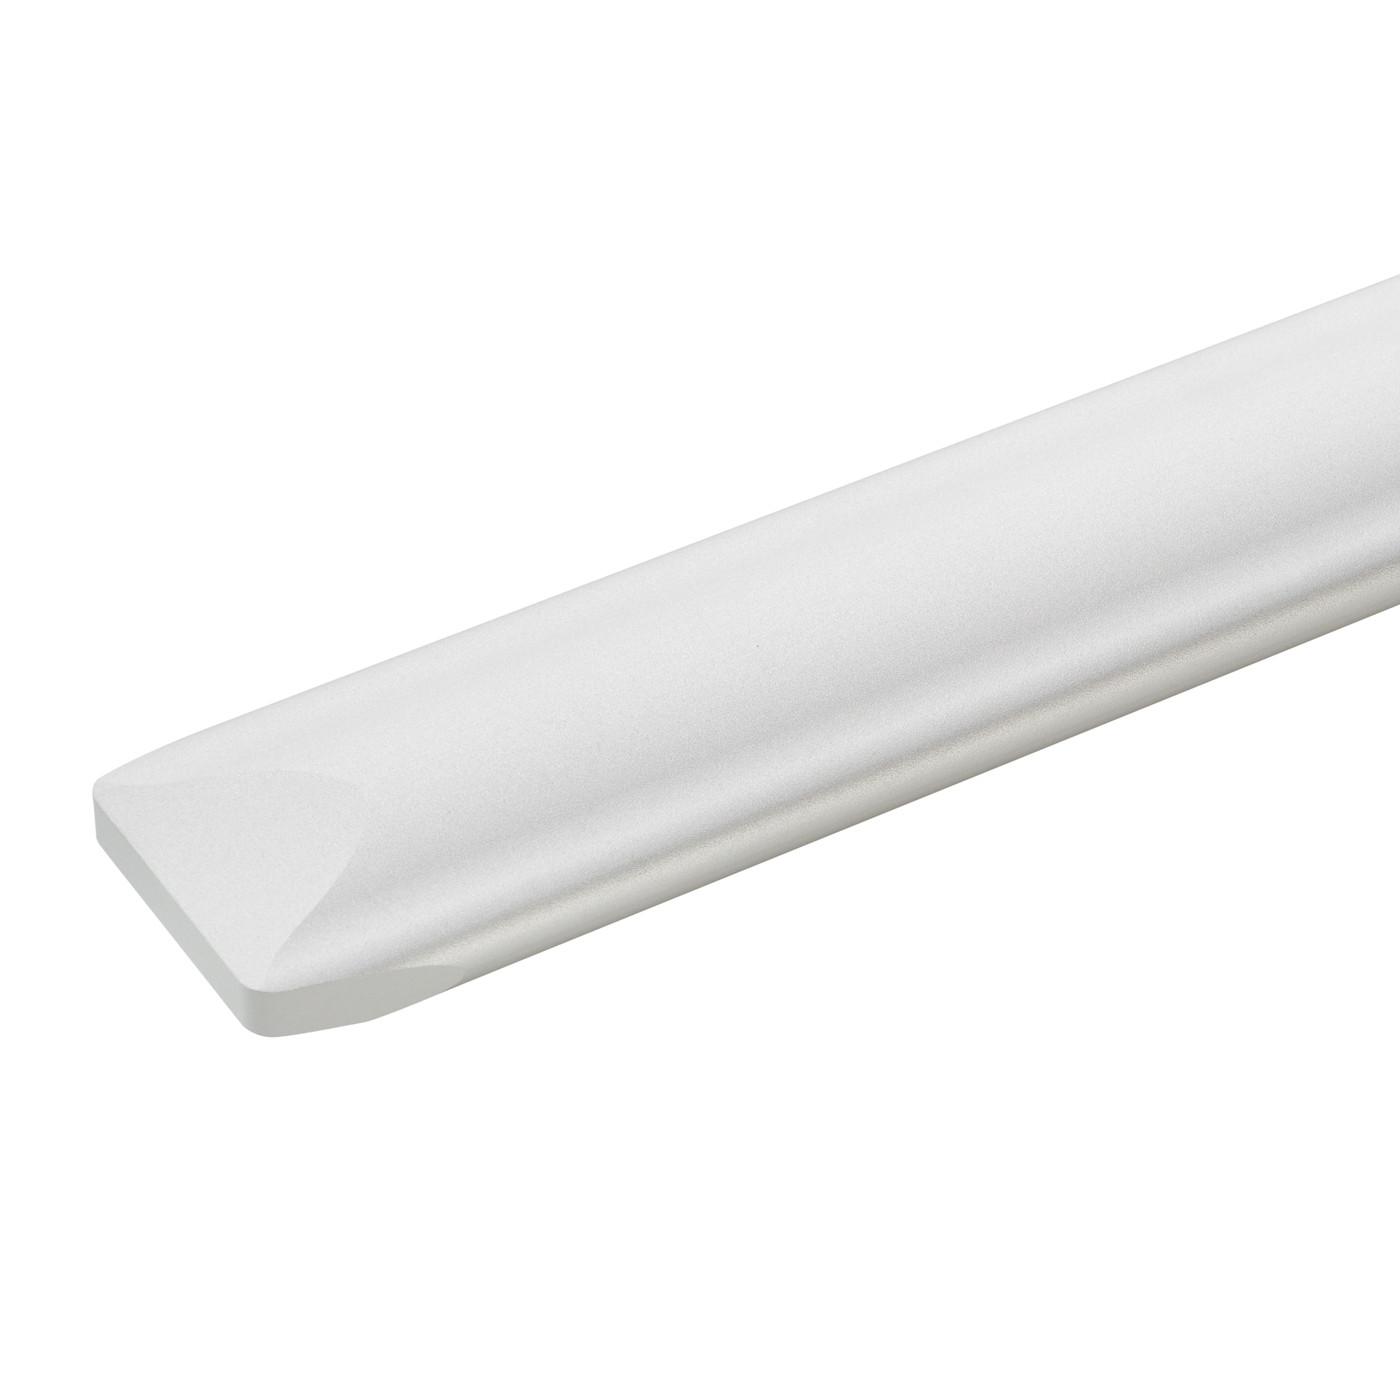 Liin Light Innovations Anax 168 Pendelleuchte